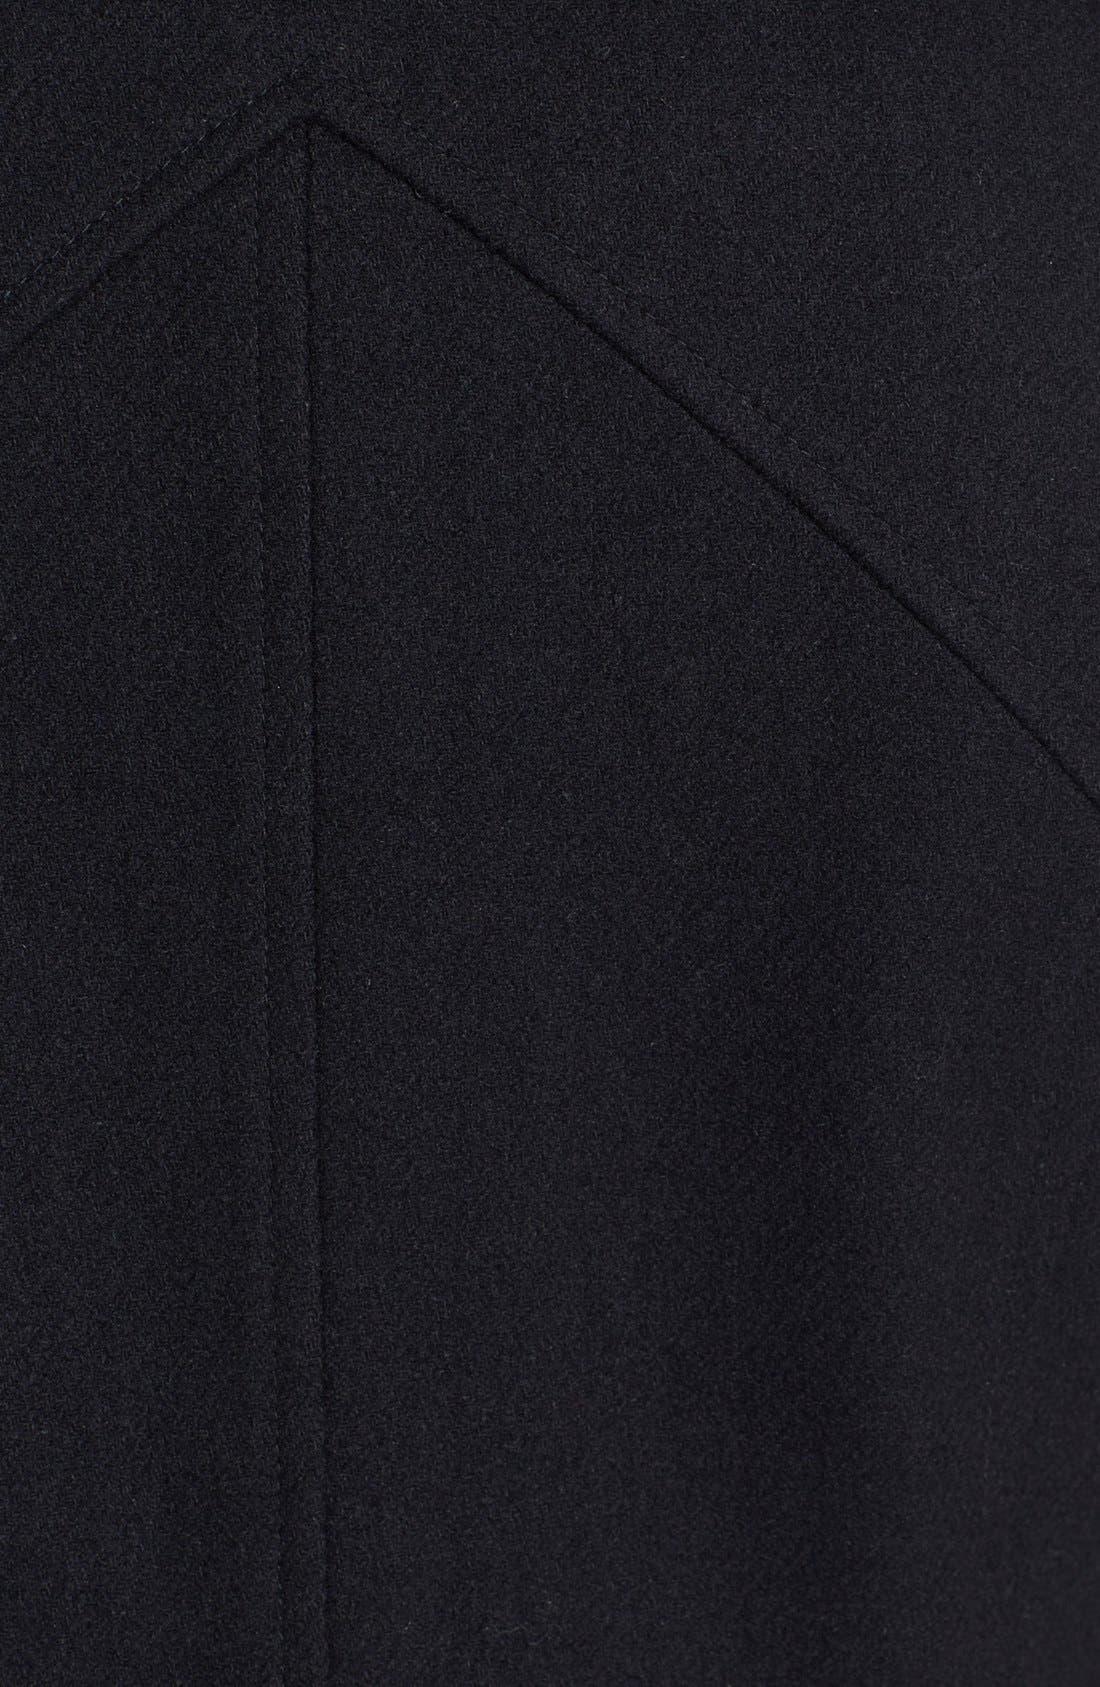 'Kit' Asymmetrical Wool Blend Coat,                             Alternate thumbnail 4, color,                             001